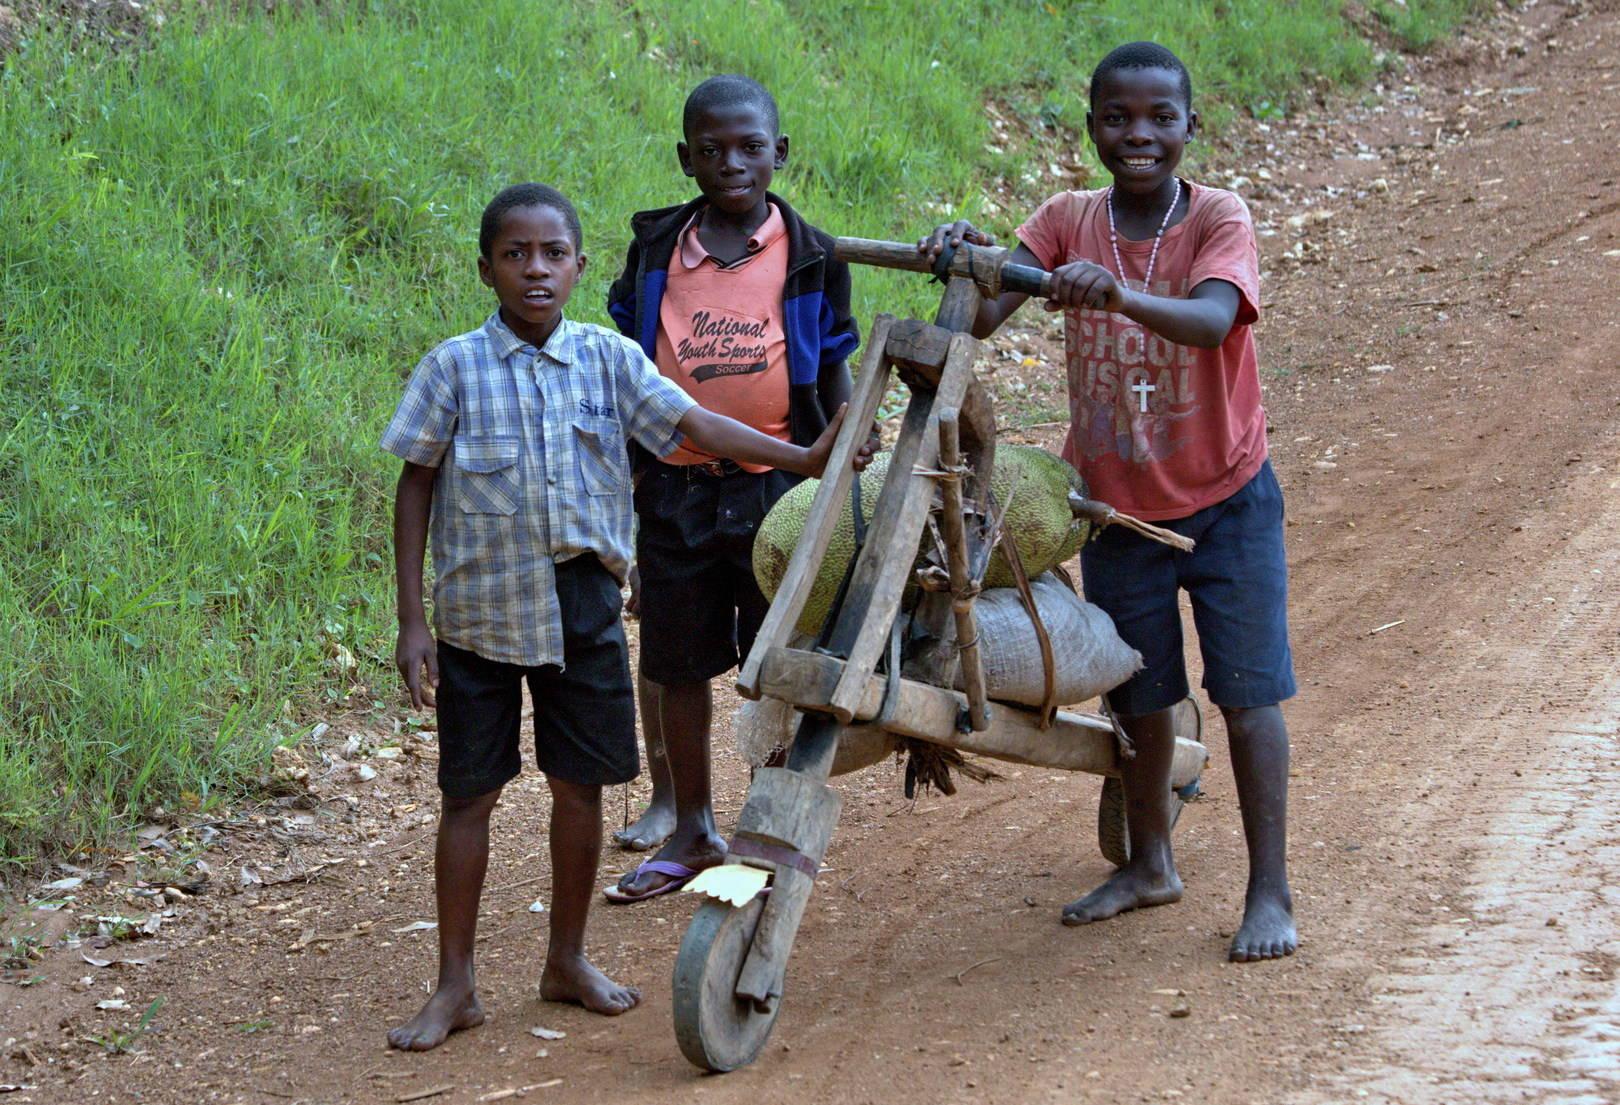 Дети Африки (Children of Africa)